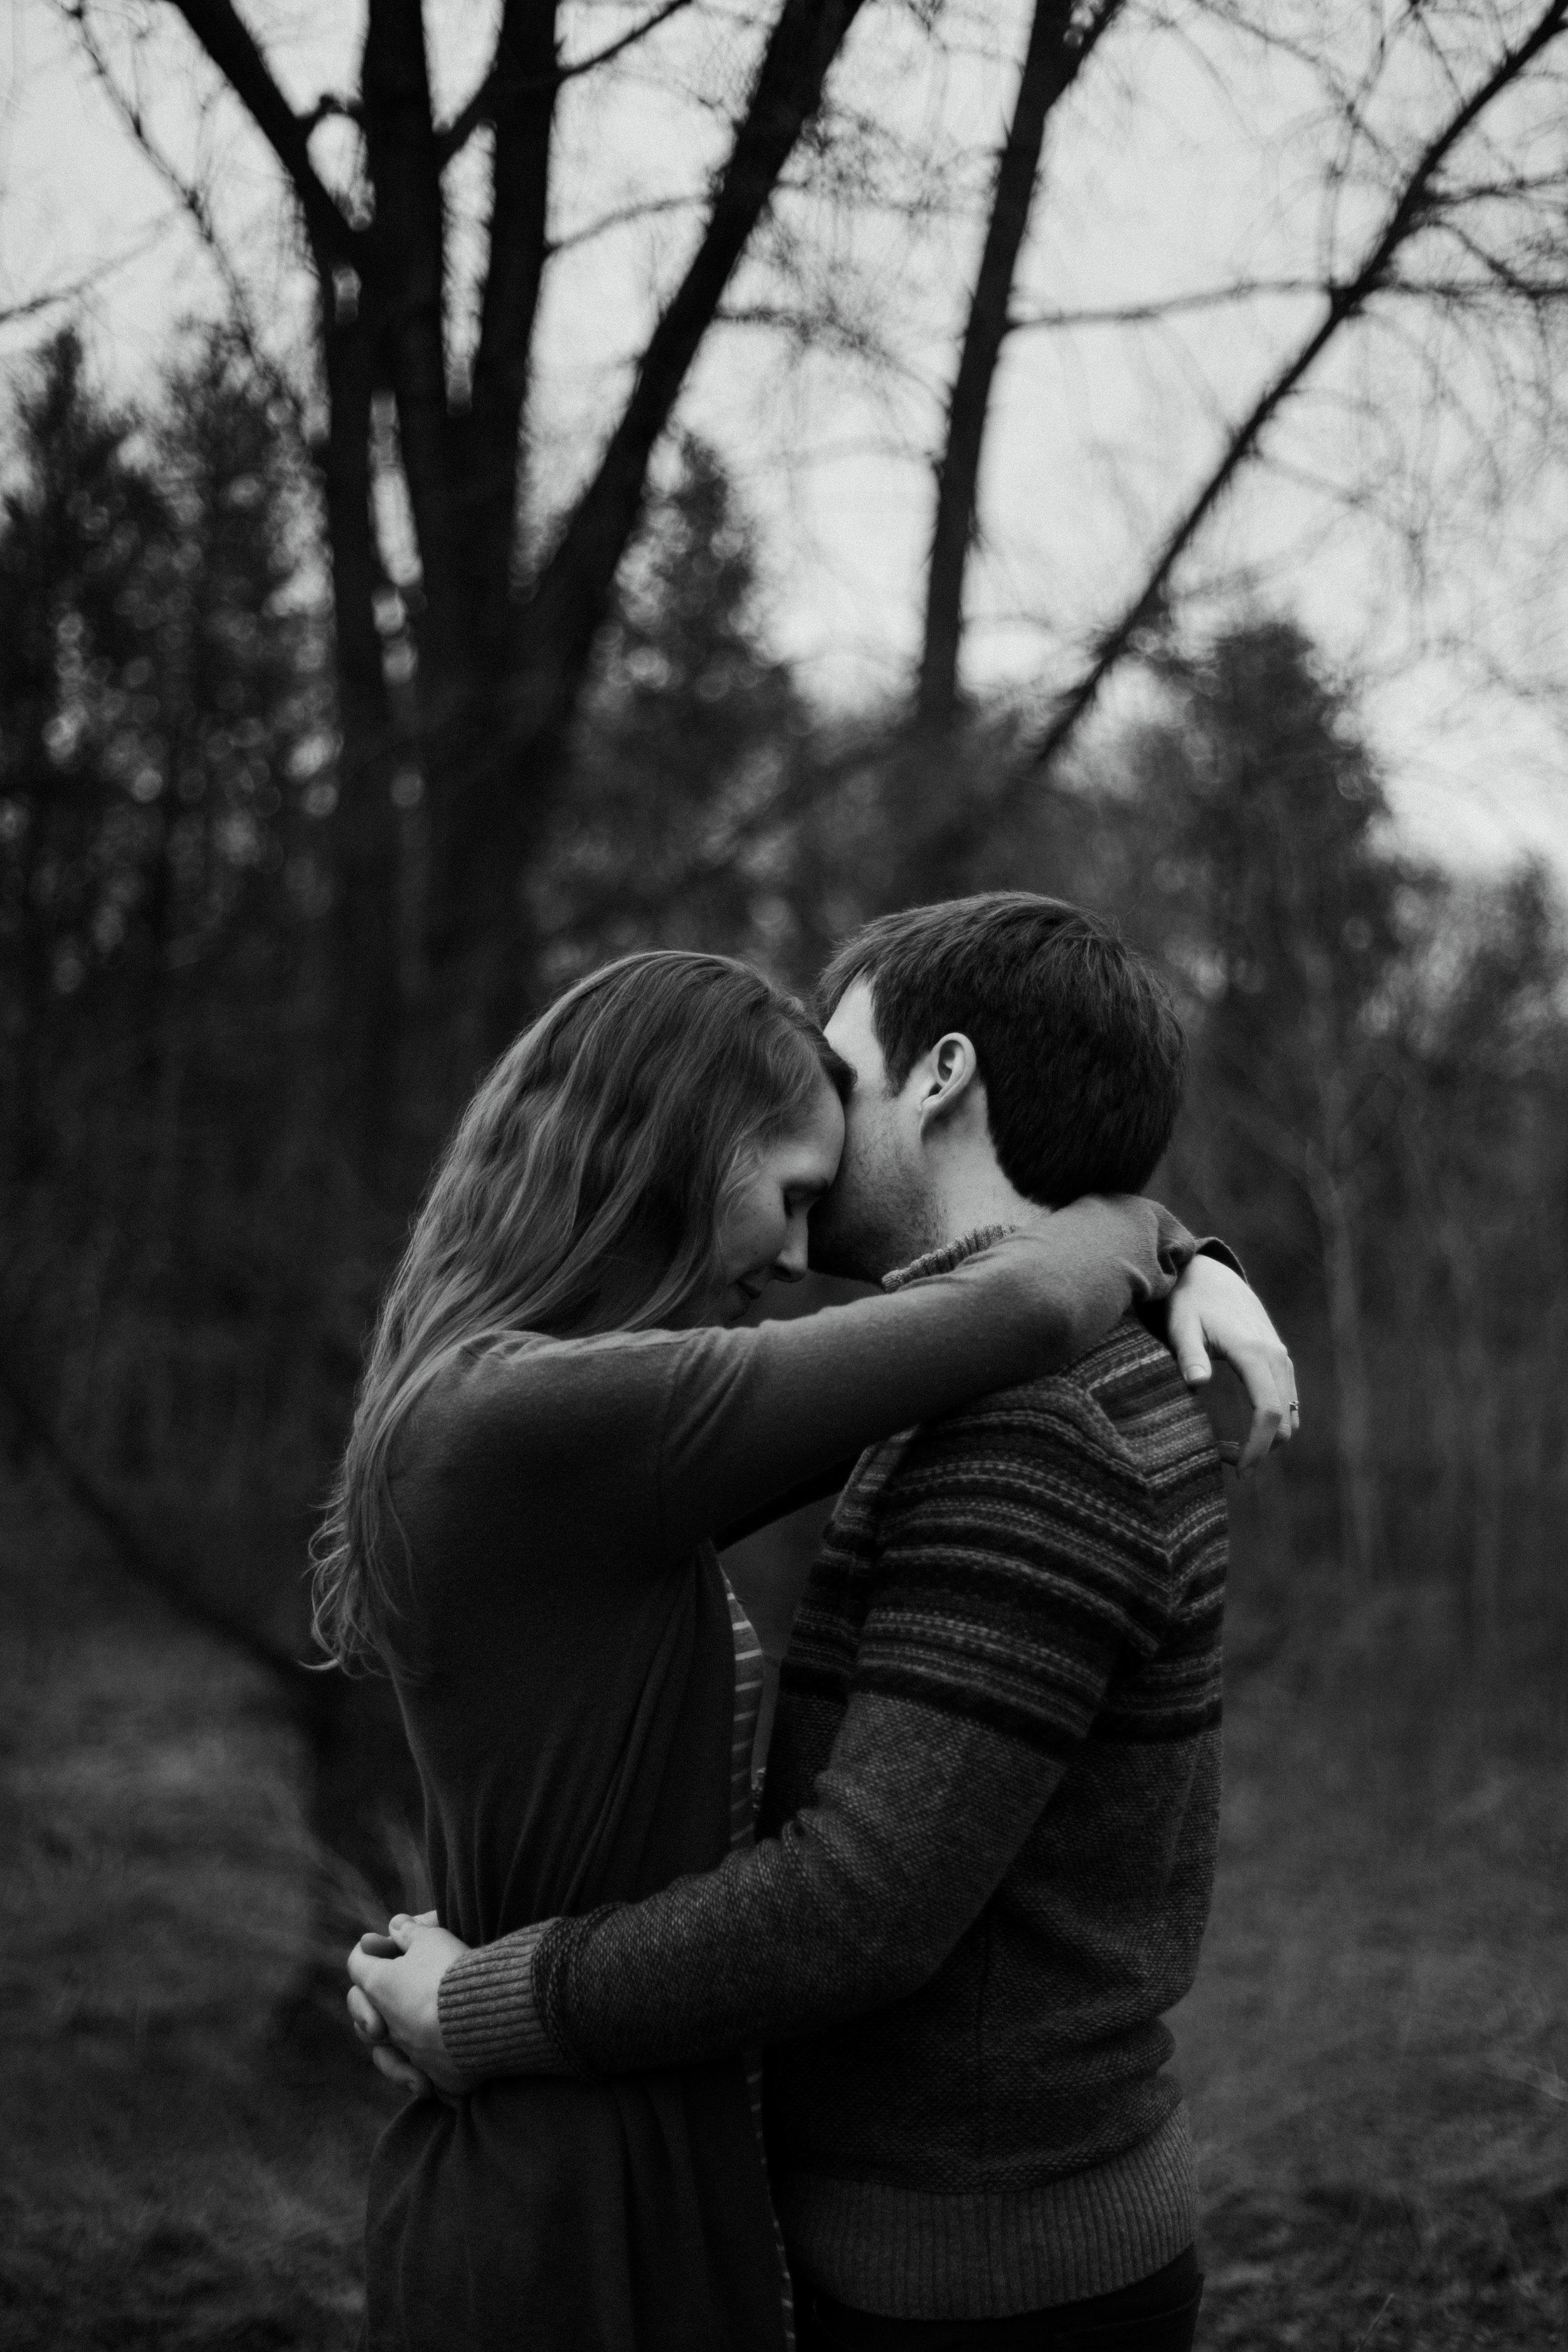 Emotional and intimate engagement photography at the Northland Arboretum. Photographed by Britt DeZeeuw, Brainerd Minnesota wedding photographer.